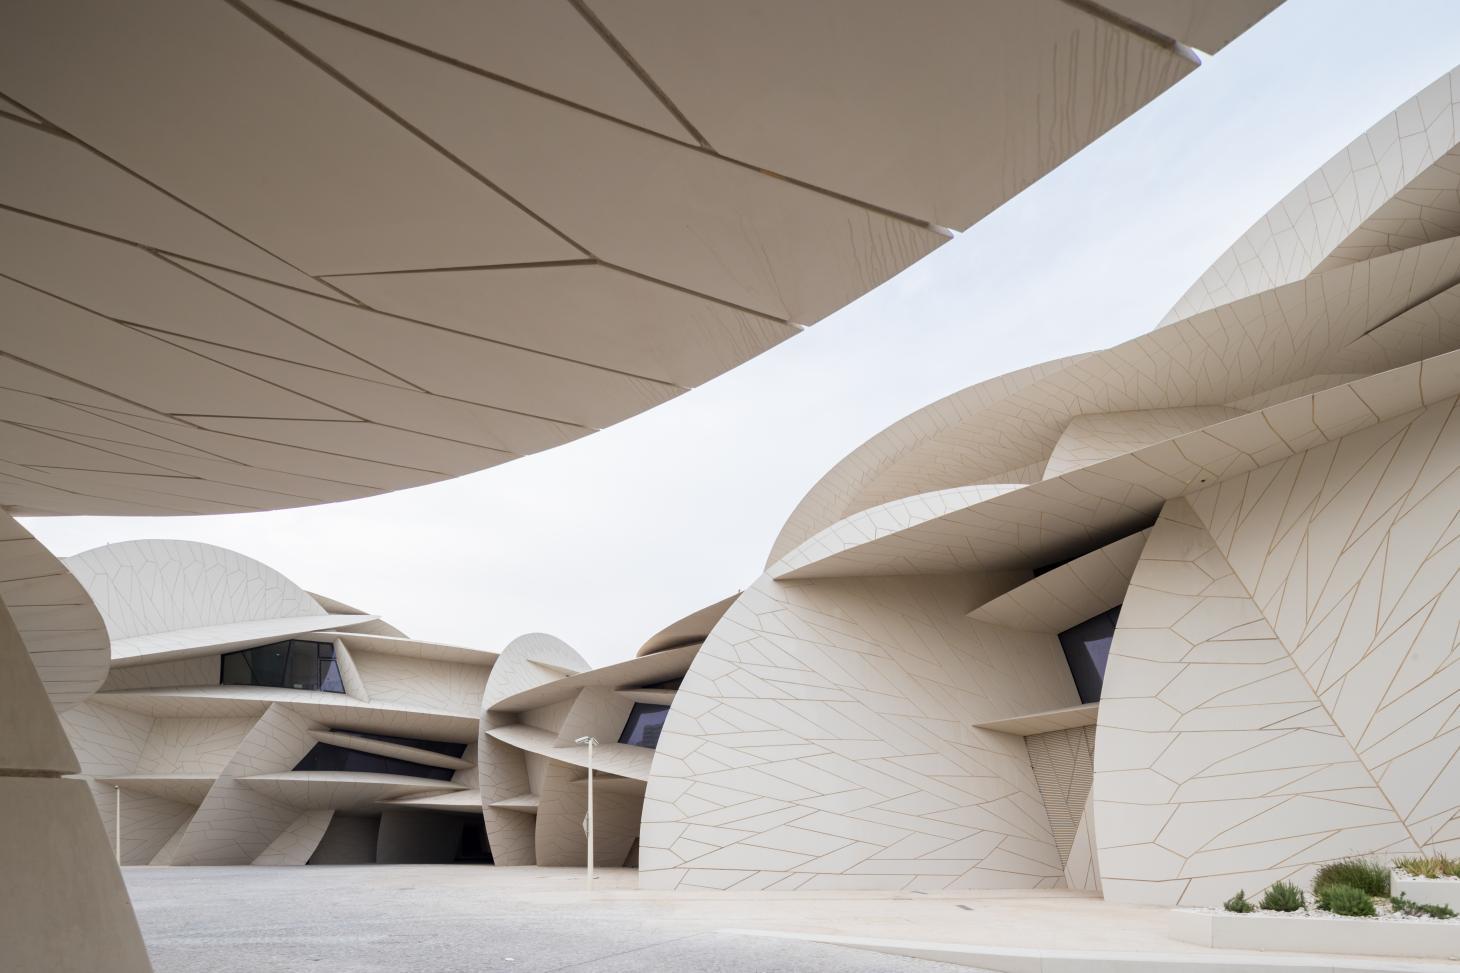 national-museum-of-qatar-.jpg